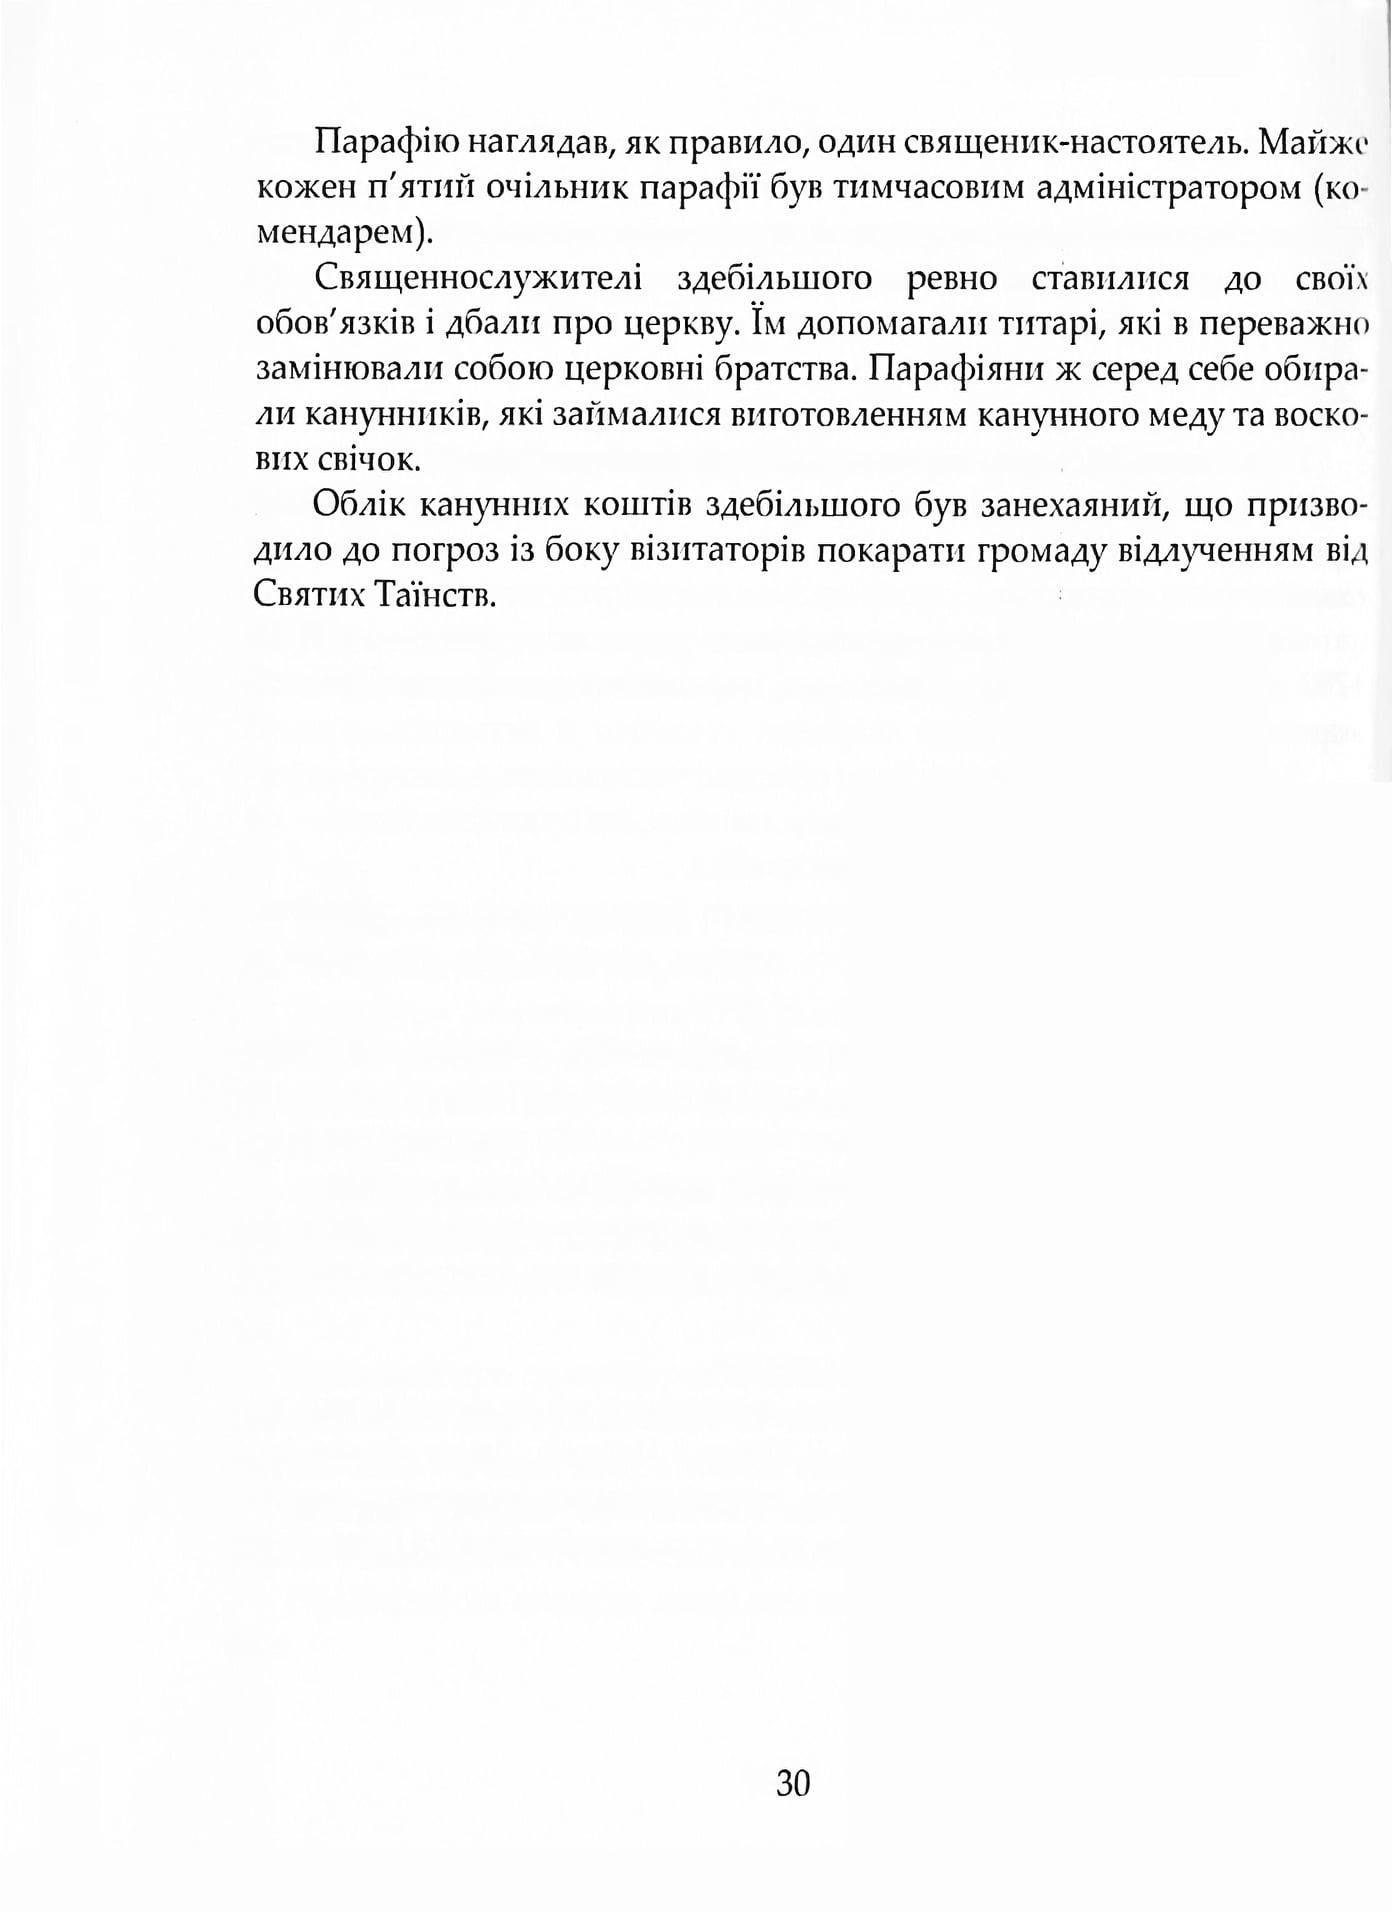 https://i6.imageban.ru/out/2021/09/23/ab007682948559030b7c9895e062cc20.jpg